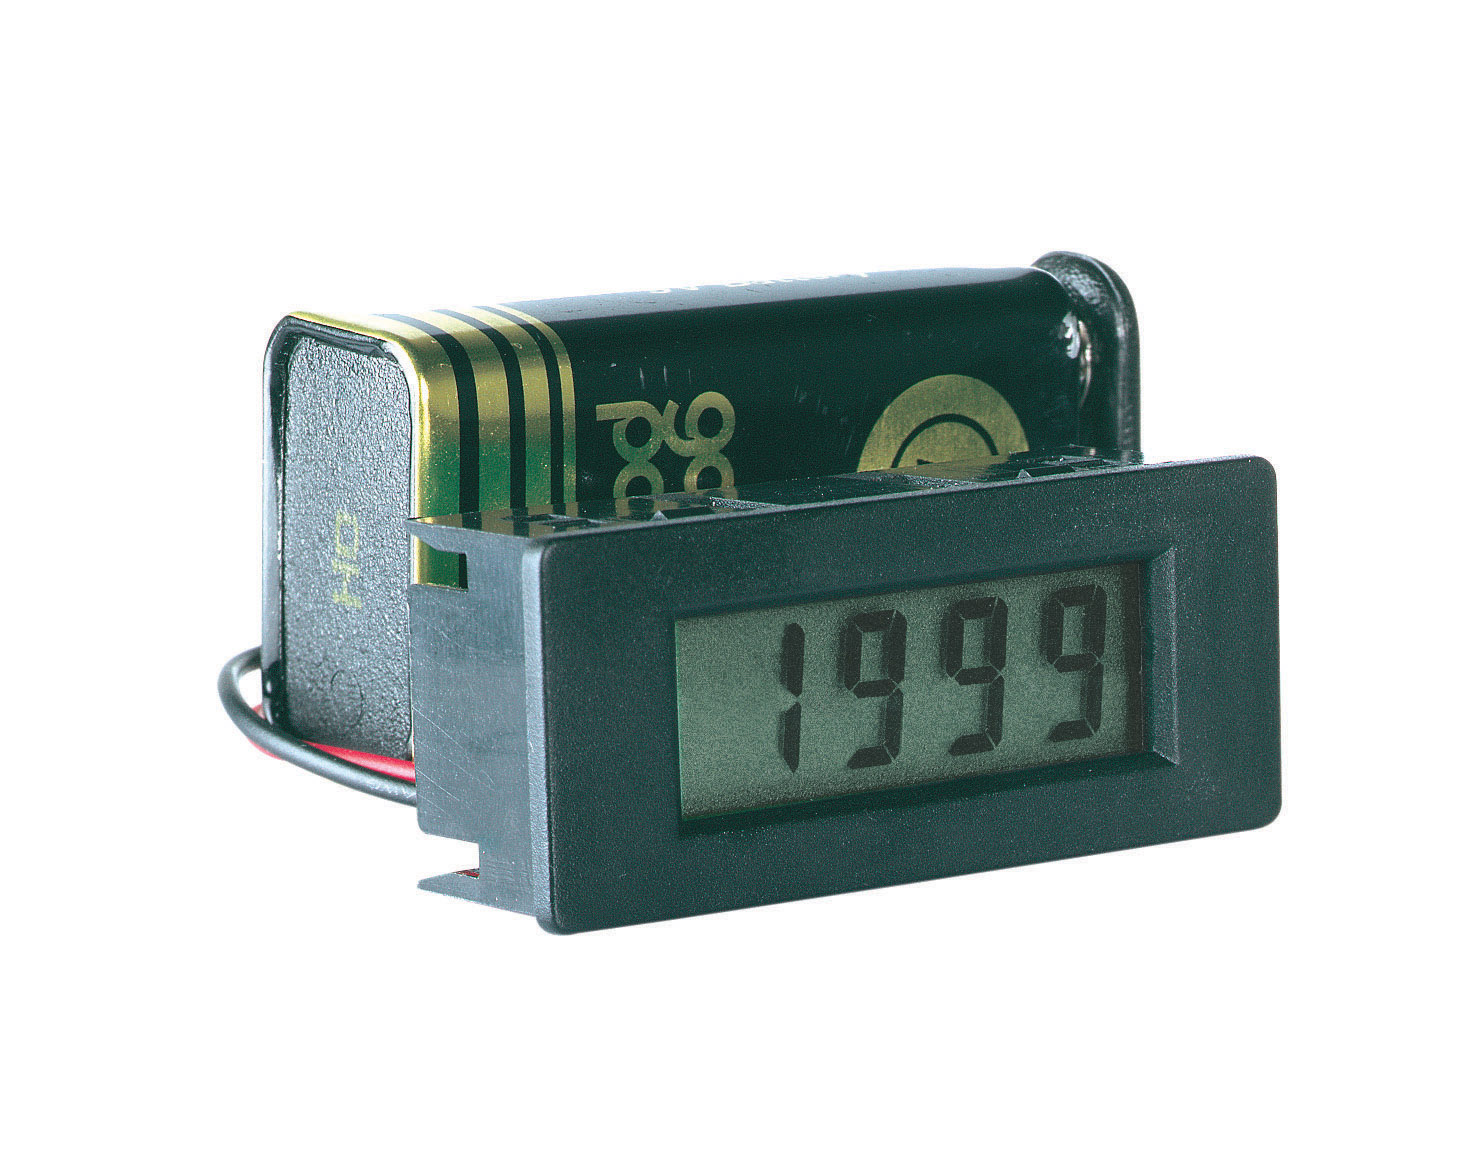 «PeakTech® LDP-335» Volt & ammeter, LCD display 8mm hight of digits